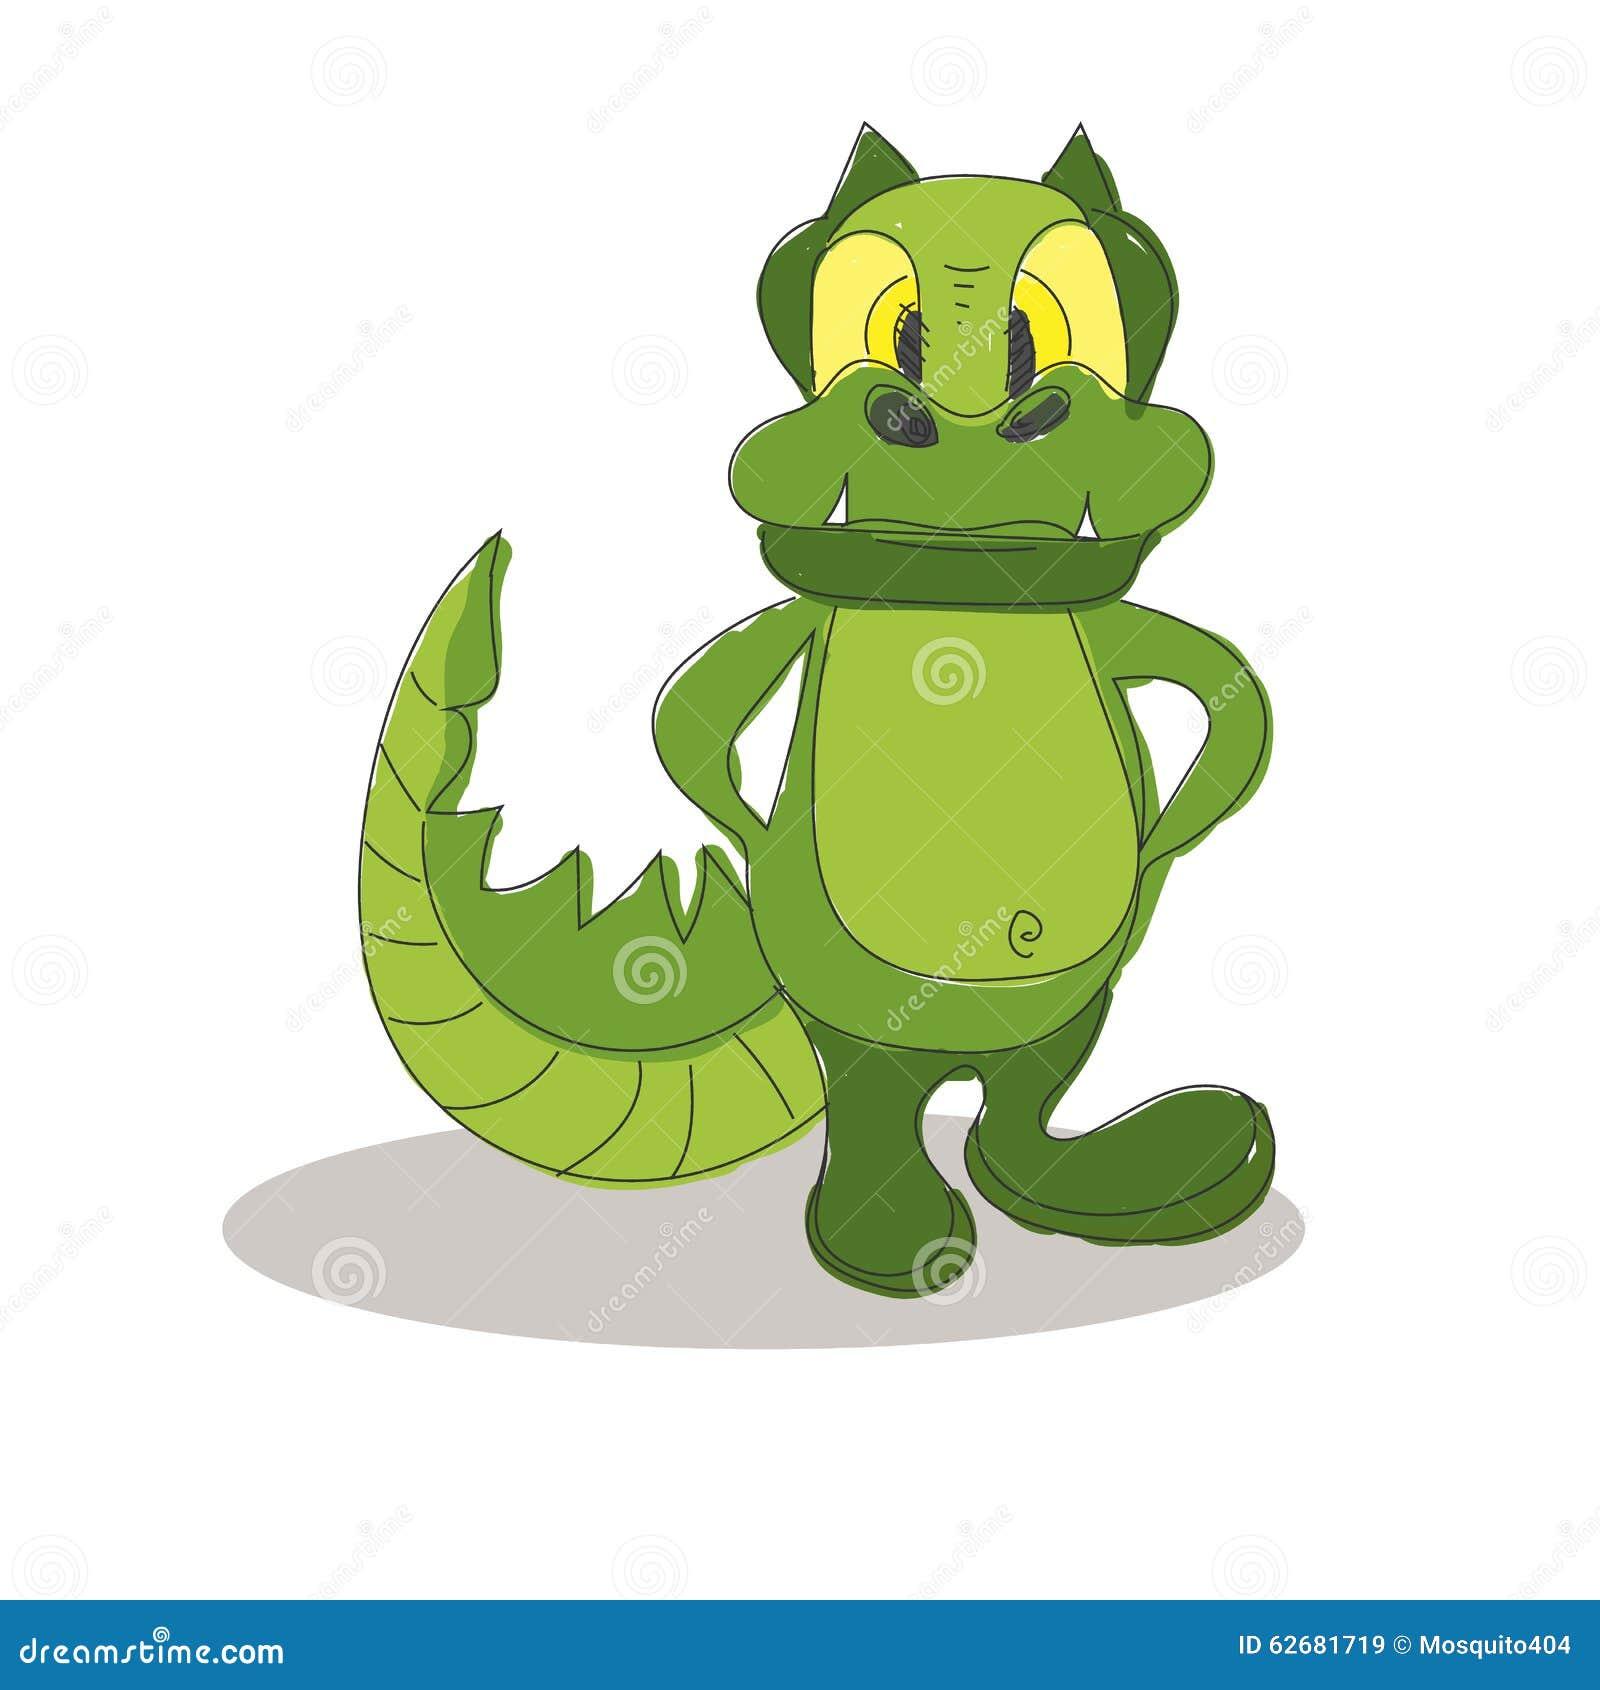 Funny Crocodile Cartoon Posing Stock Vector - Image: 62681719 - photo#32